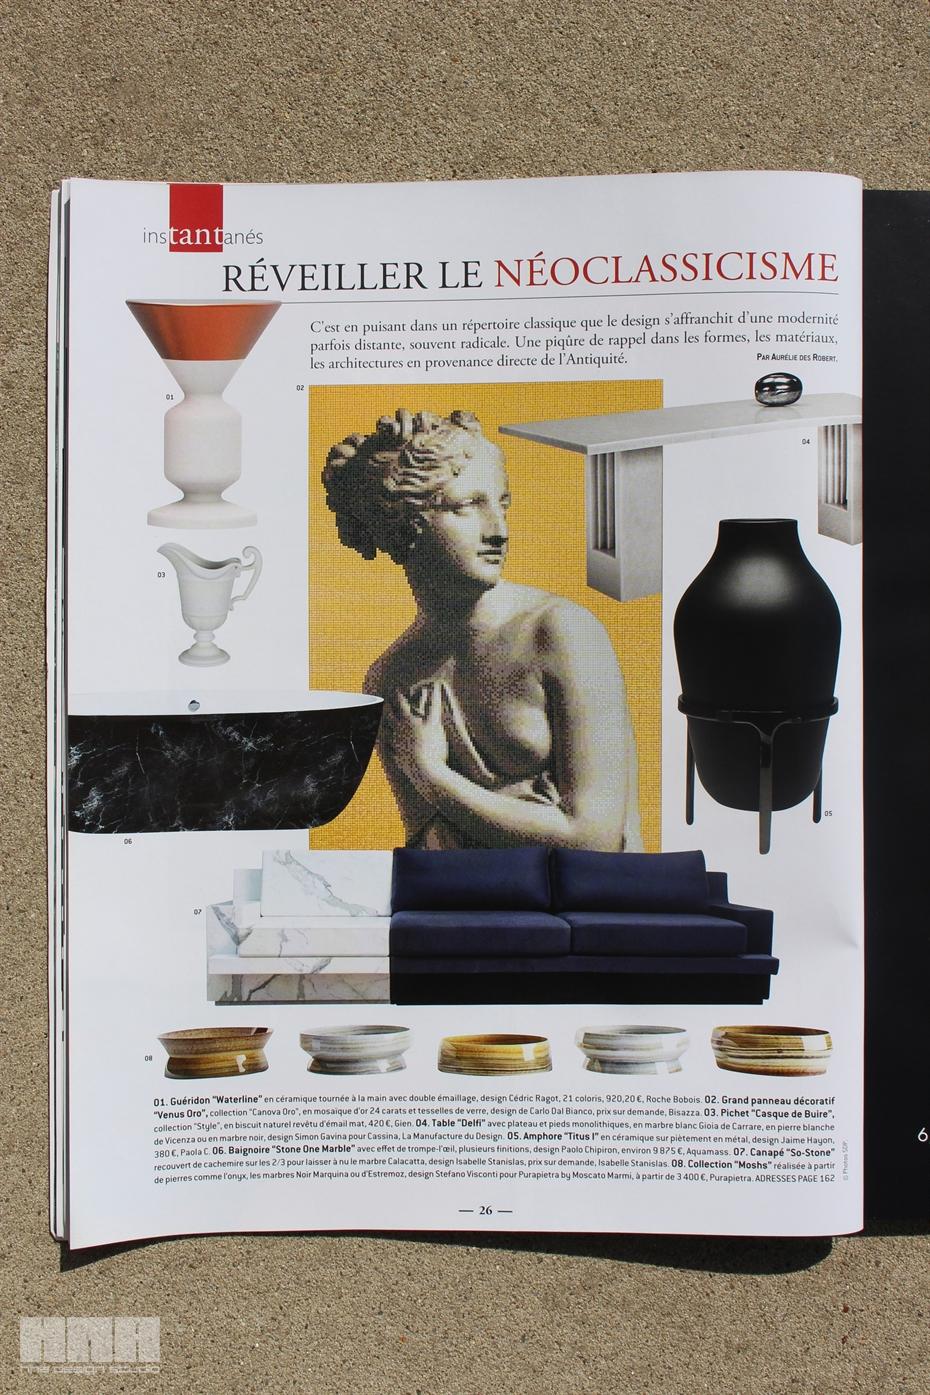 hna design inspiralo magazinok paris 2